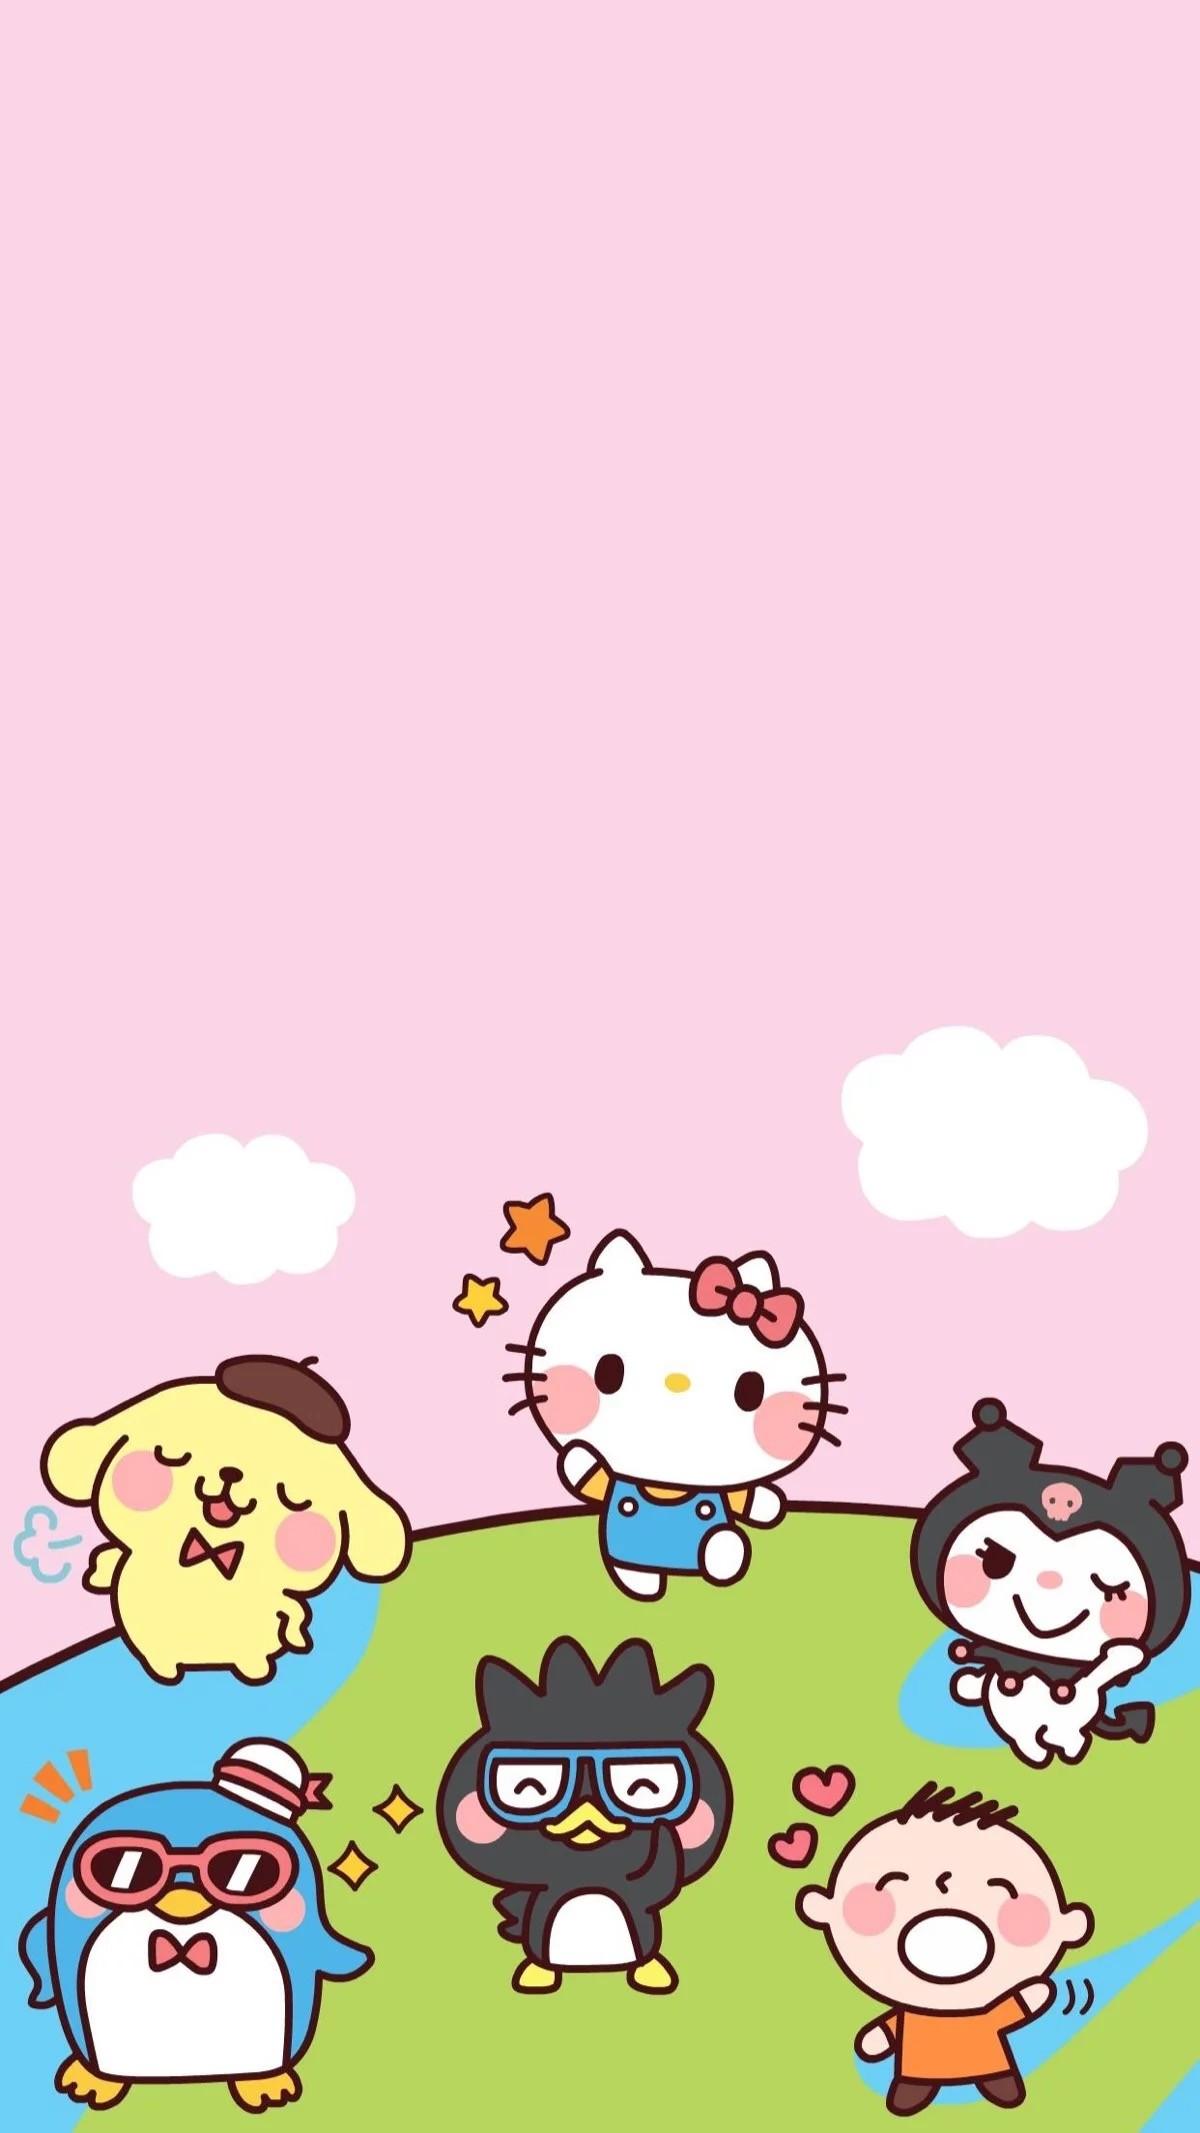 Sanrio Wallpaper, Iphone Wallpaper, Hello Kitty, Twins, Printing, Sticker,  Stationery, Kawaii, Screen